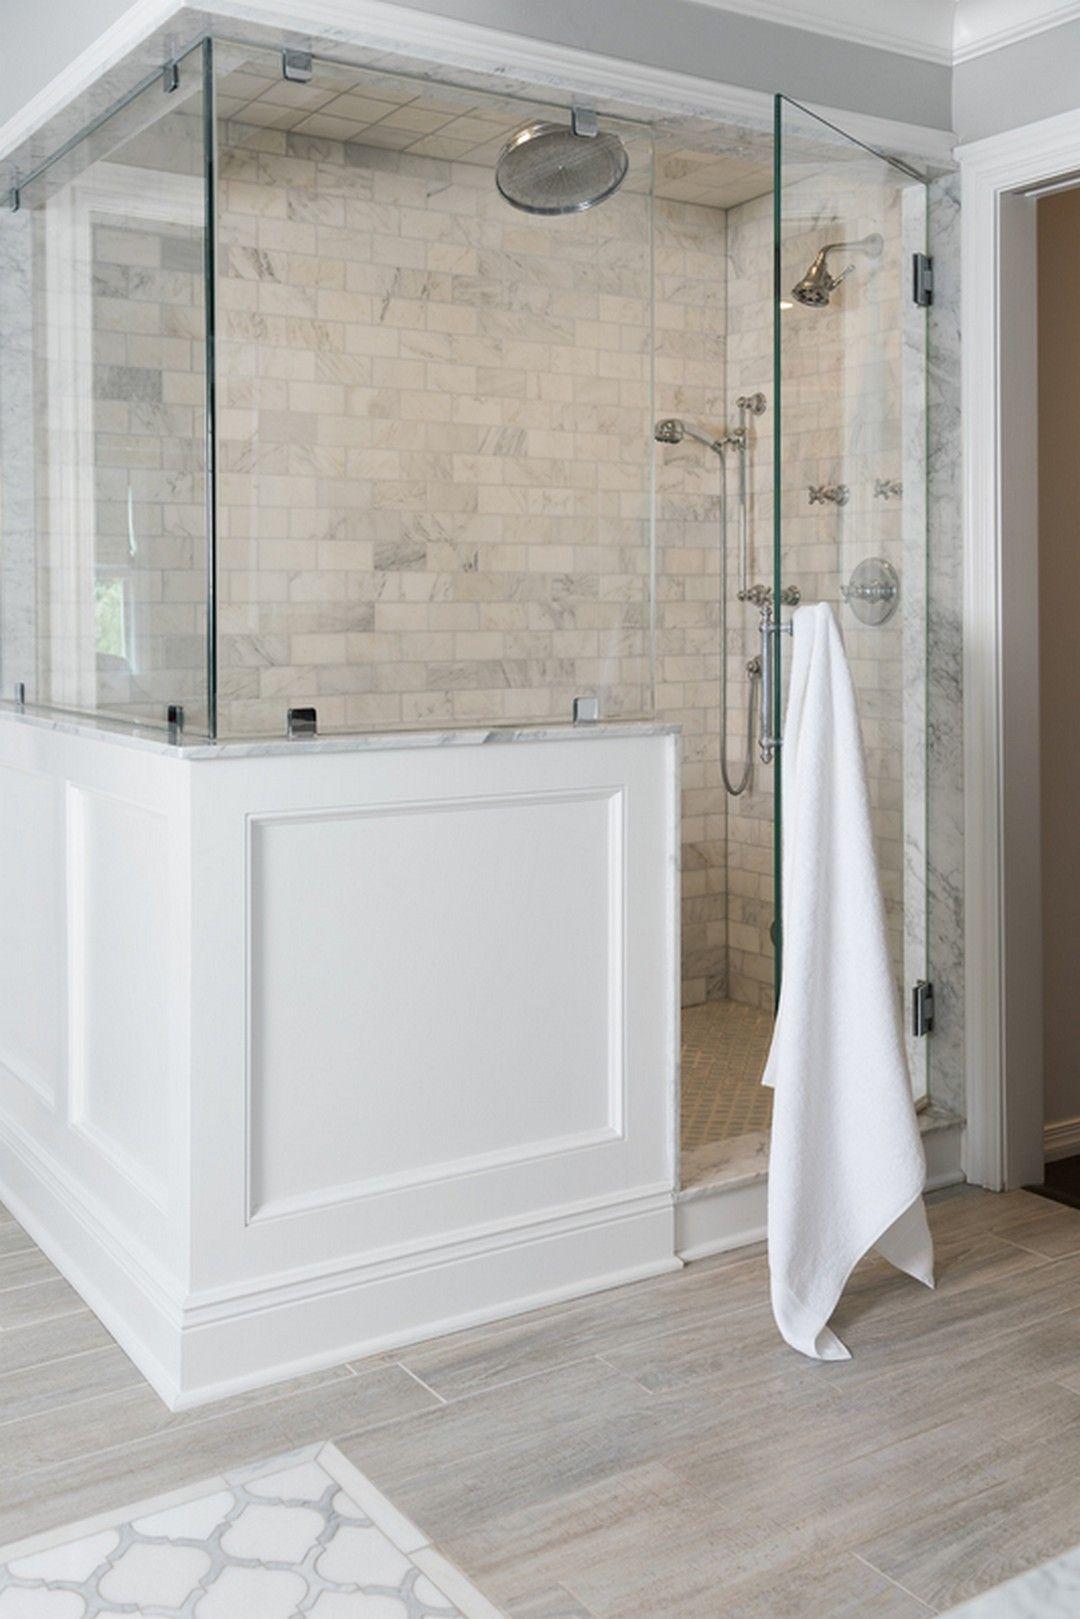 20 Beautiful Urban Farmhouse Master Bathroom Remodel Ideas | For the ...